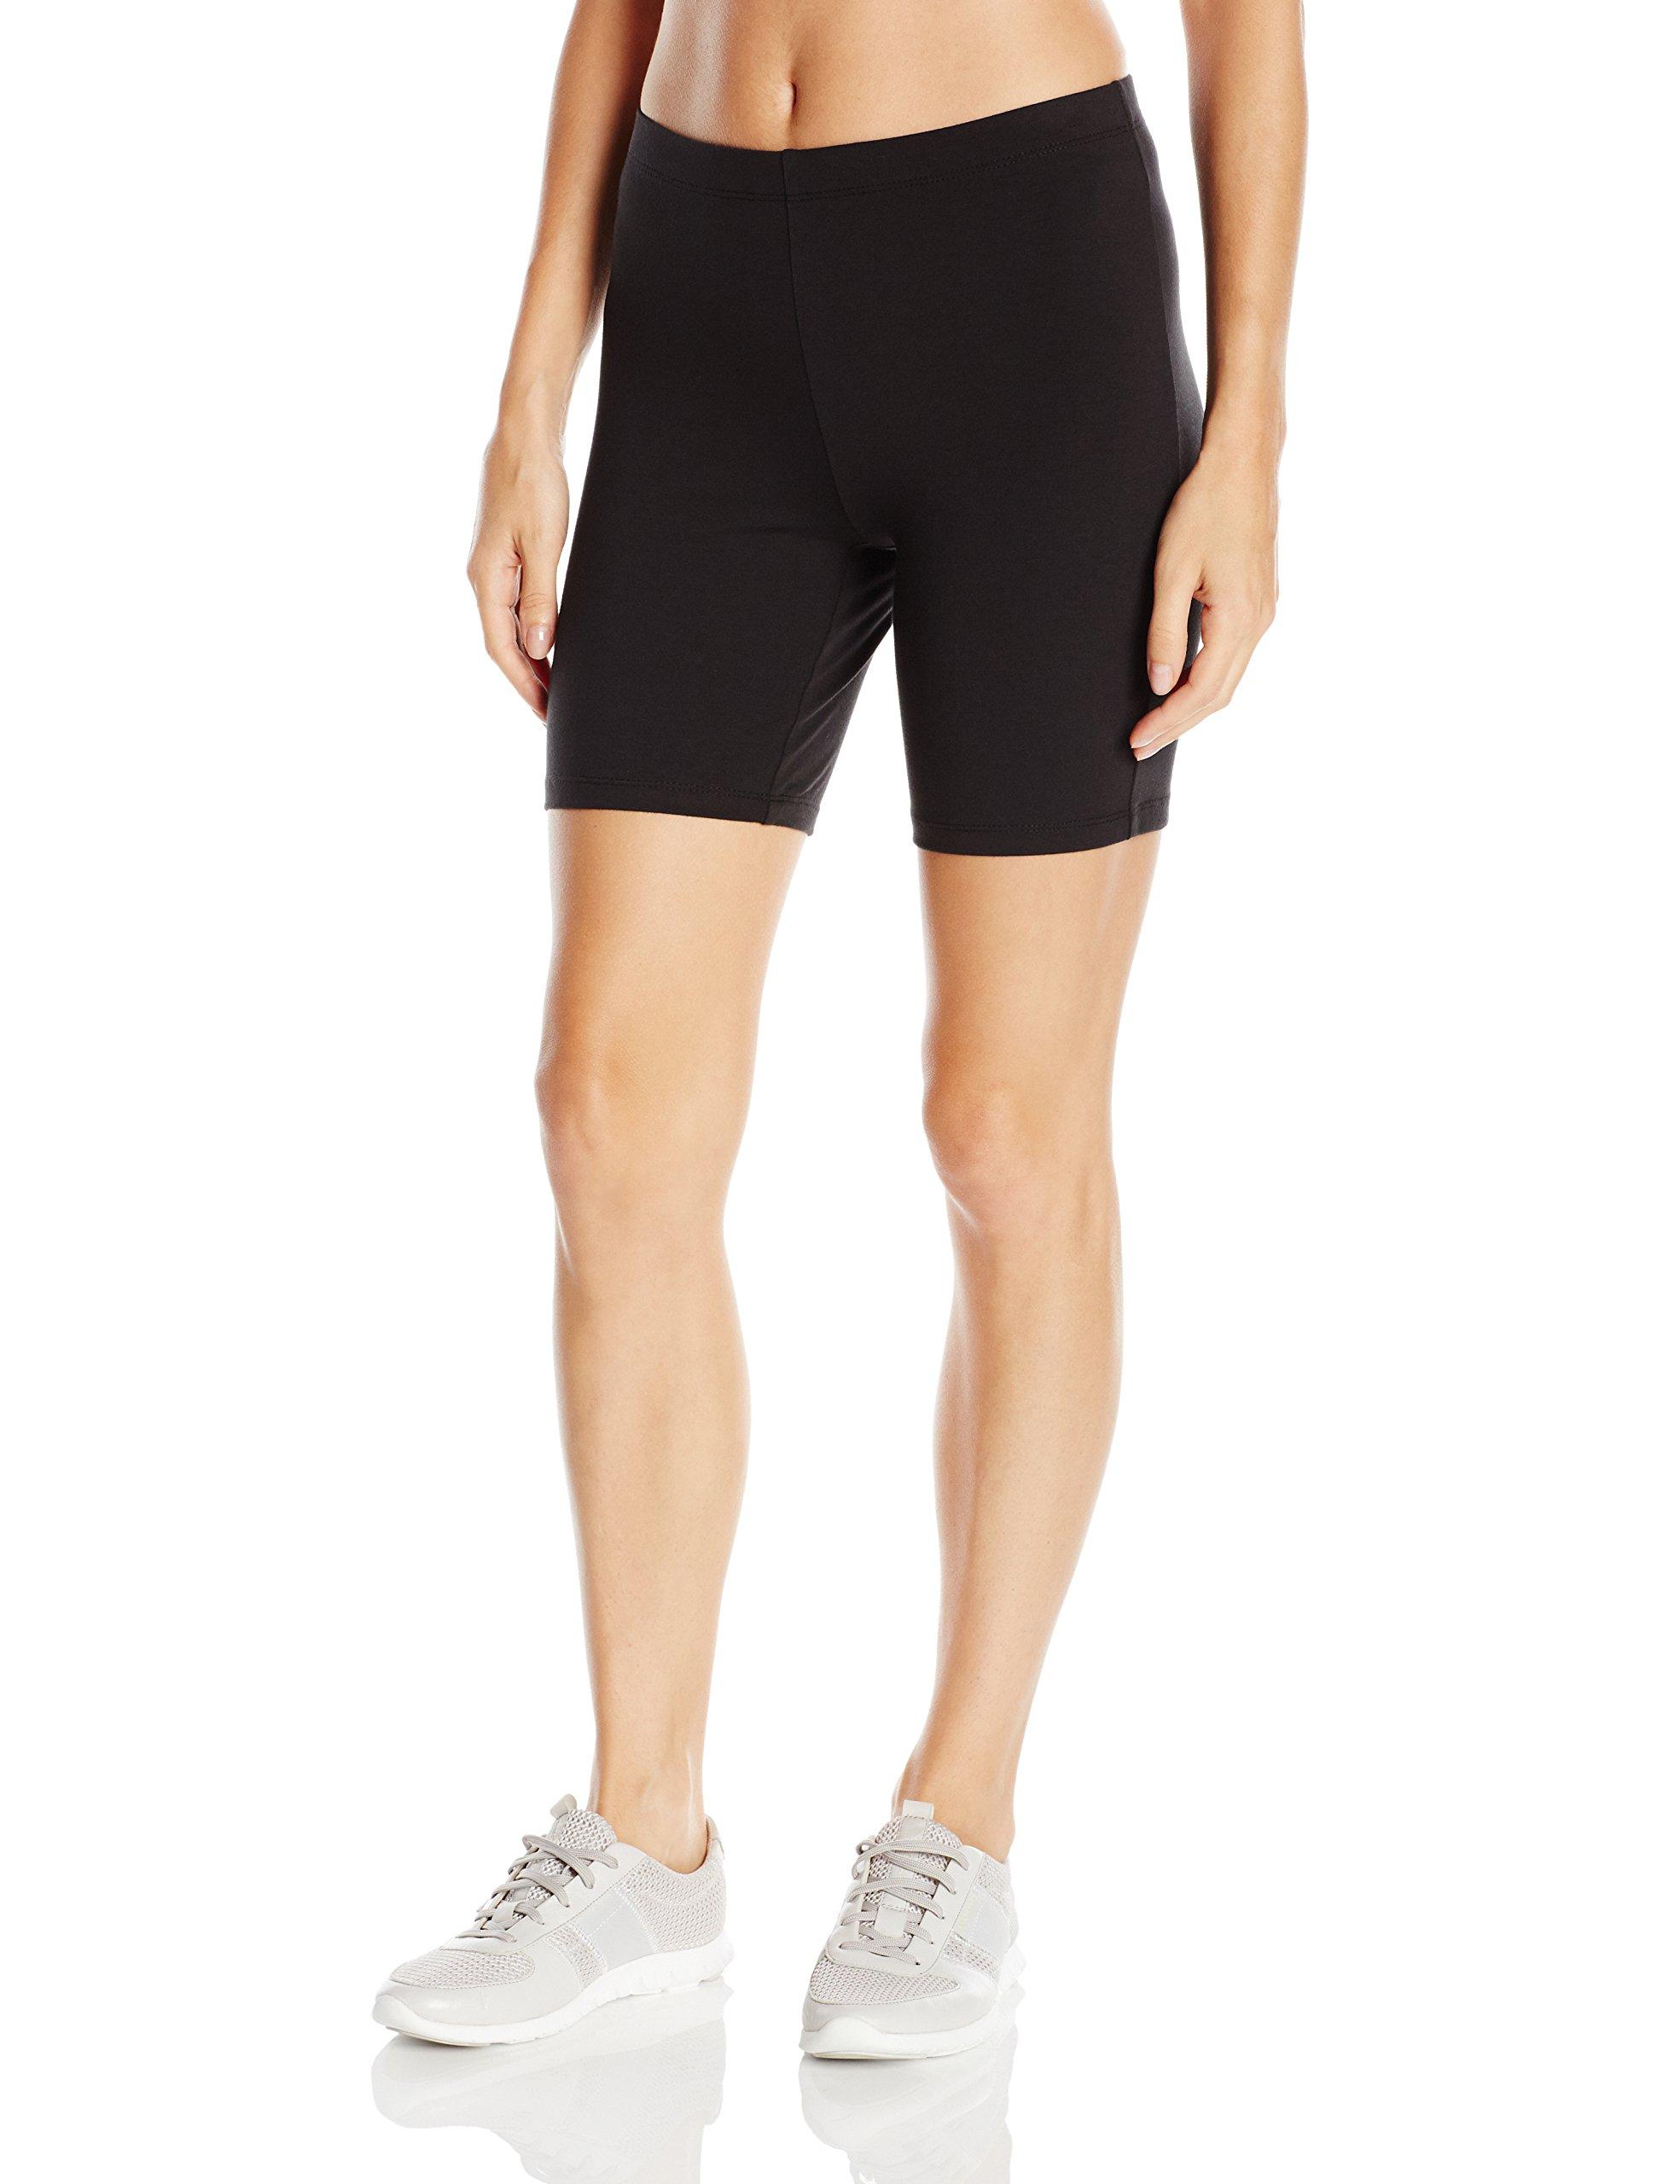 Hanes Women's Stretch Jersey Bike Short, Black, Medium